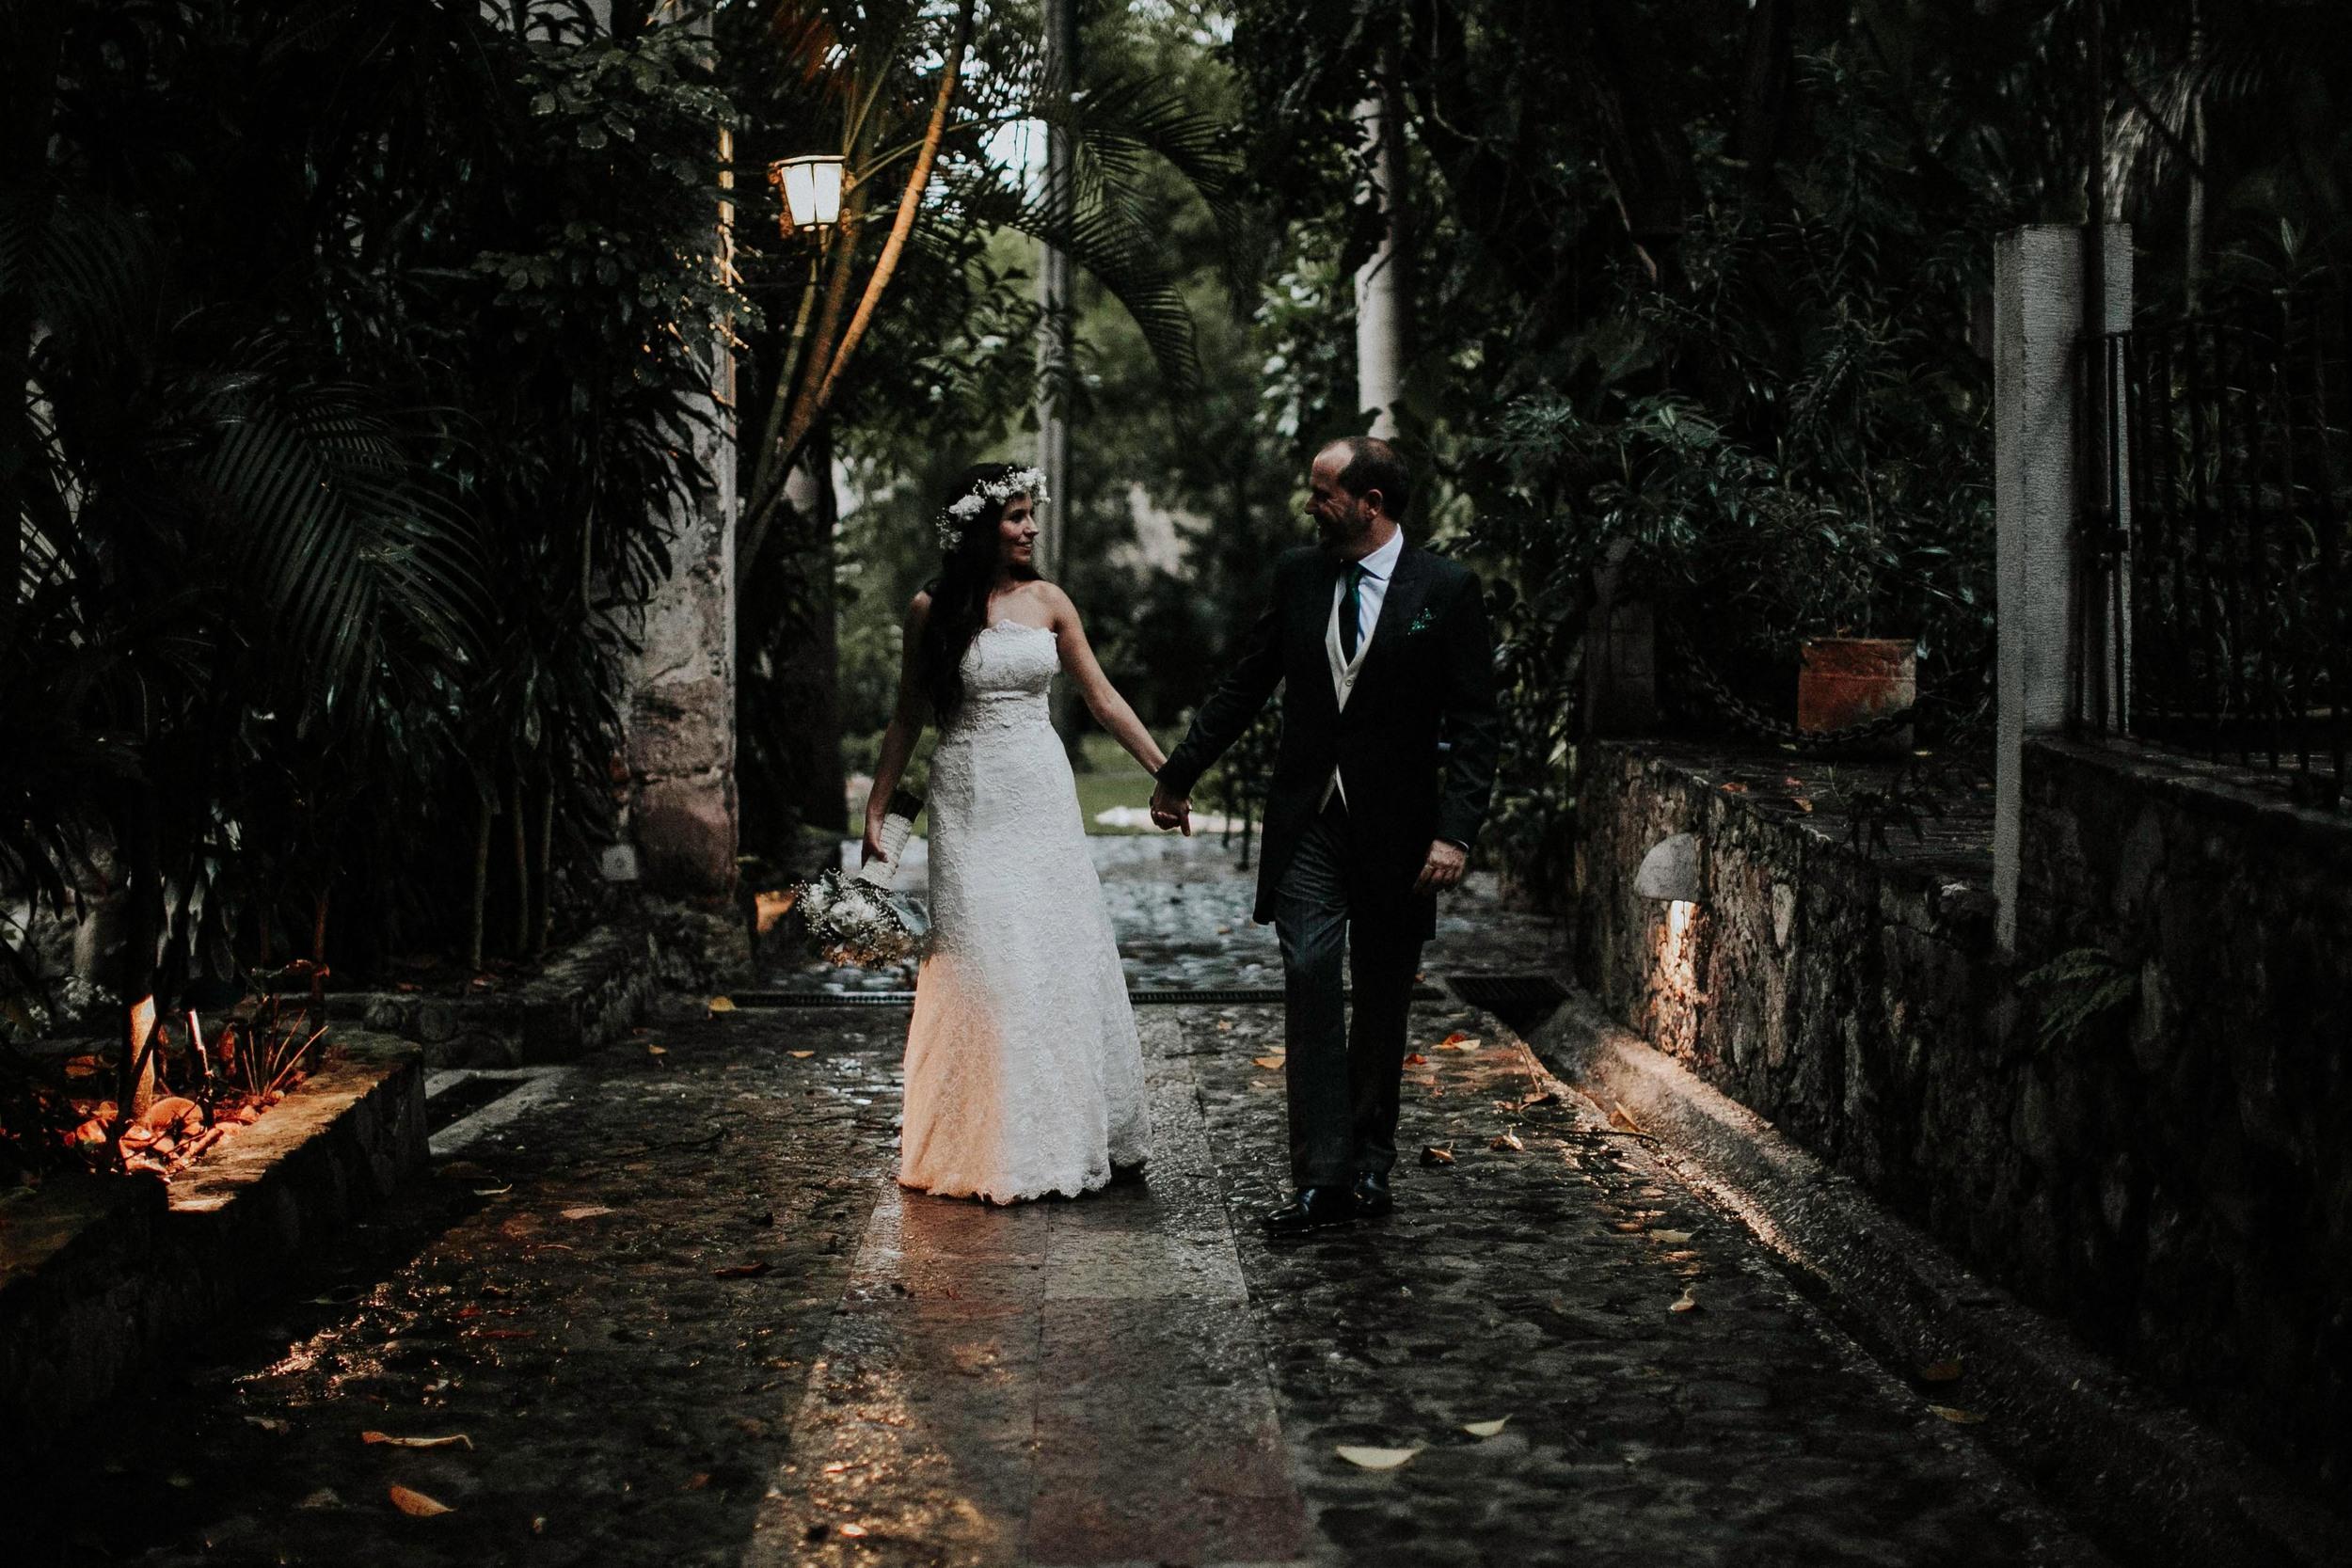 DJ8A9088-Editaralfonso_flores_destination_wedding_photographer_San_gabriel_de_las_palmas.jpg